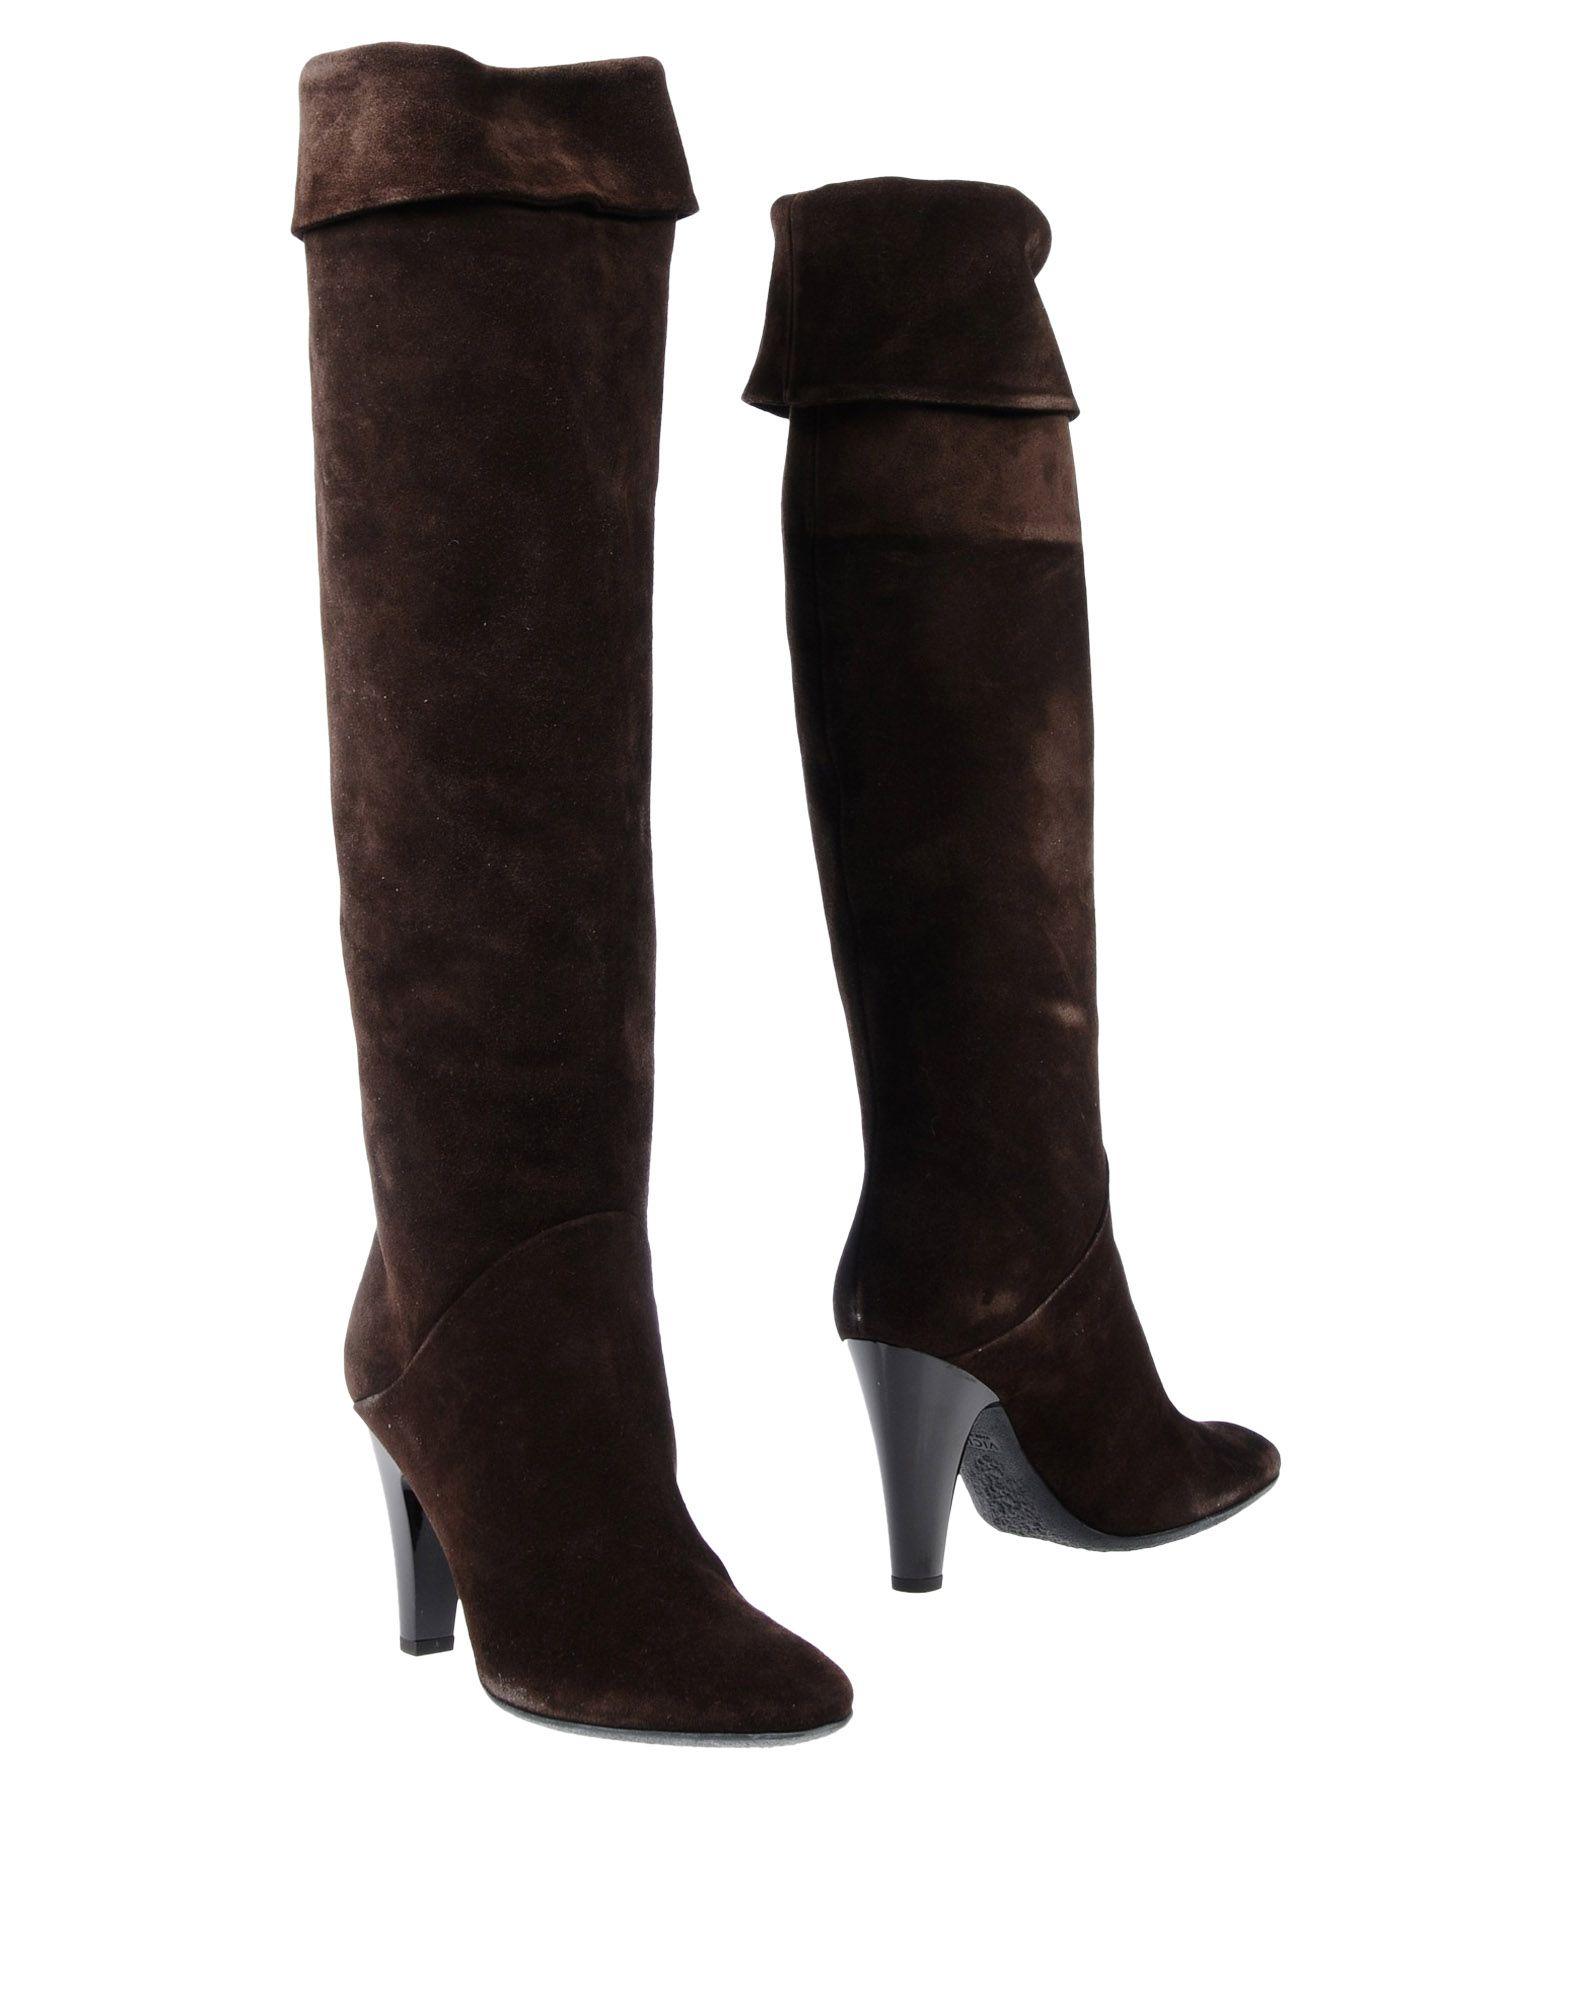 Giuseppe Zanotti Stiefel 11414211TT Damen  11414211TT Stiefel Neue Schuhe d56cae